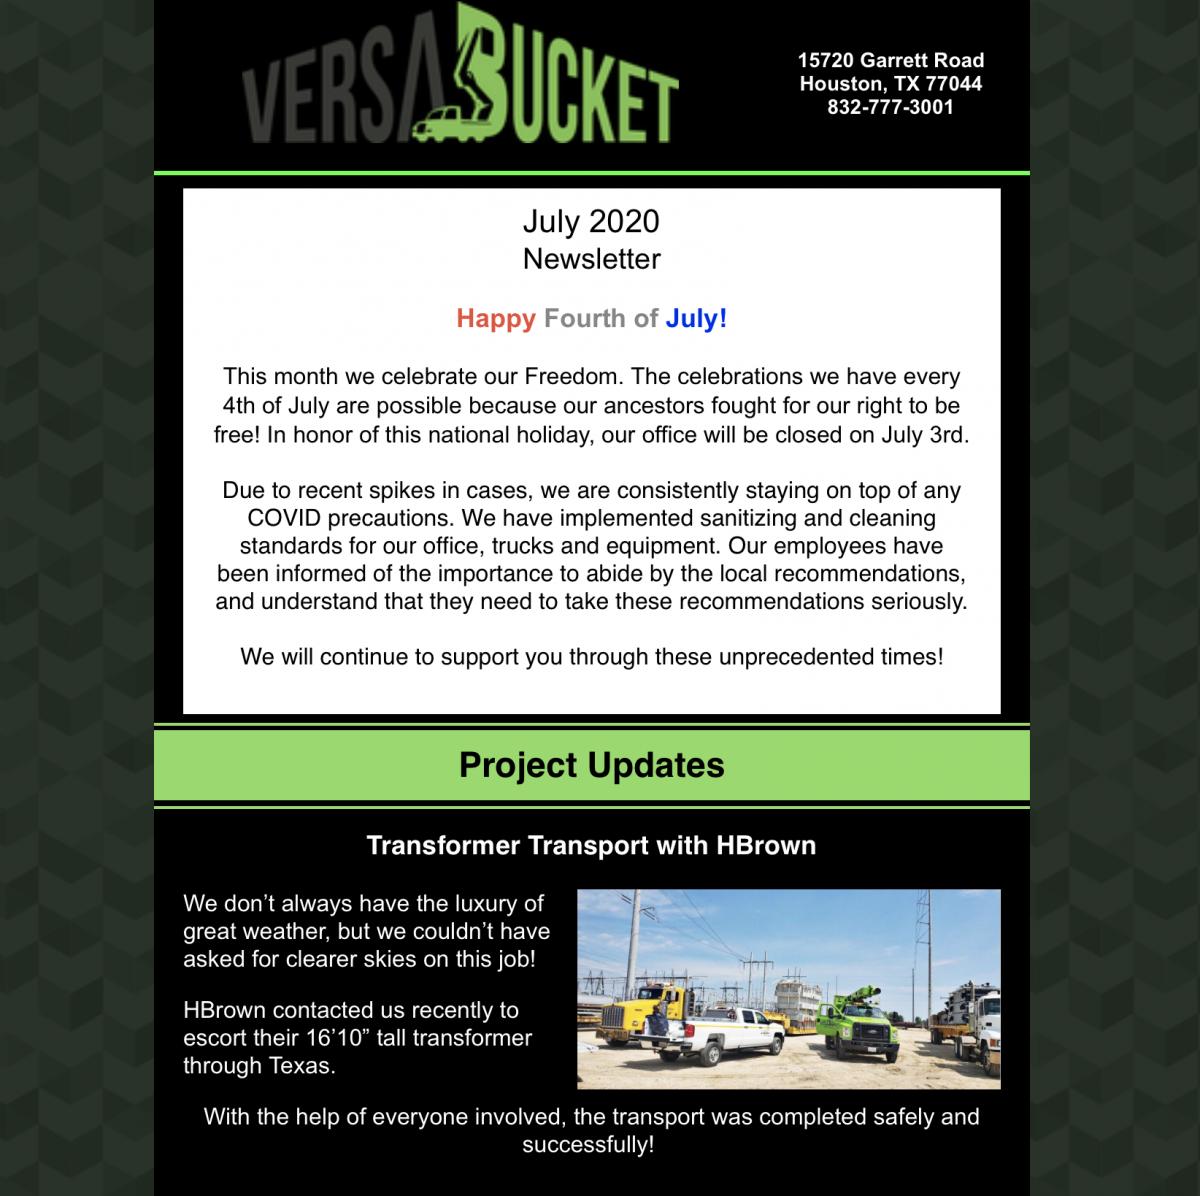 09JUL20-newsletter-post-1200x1196.png